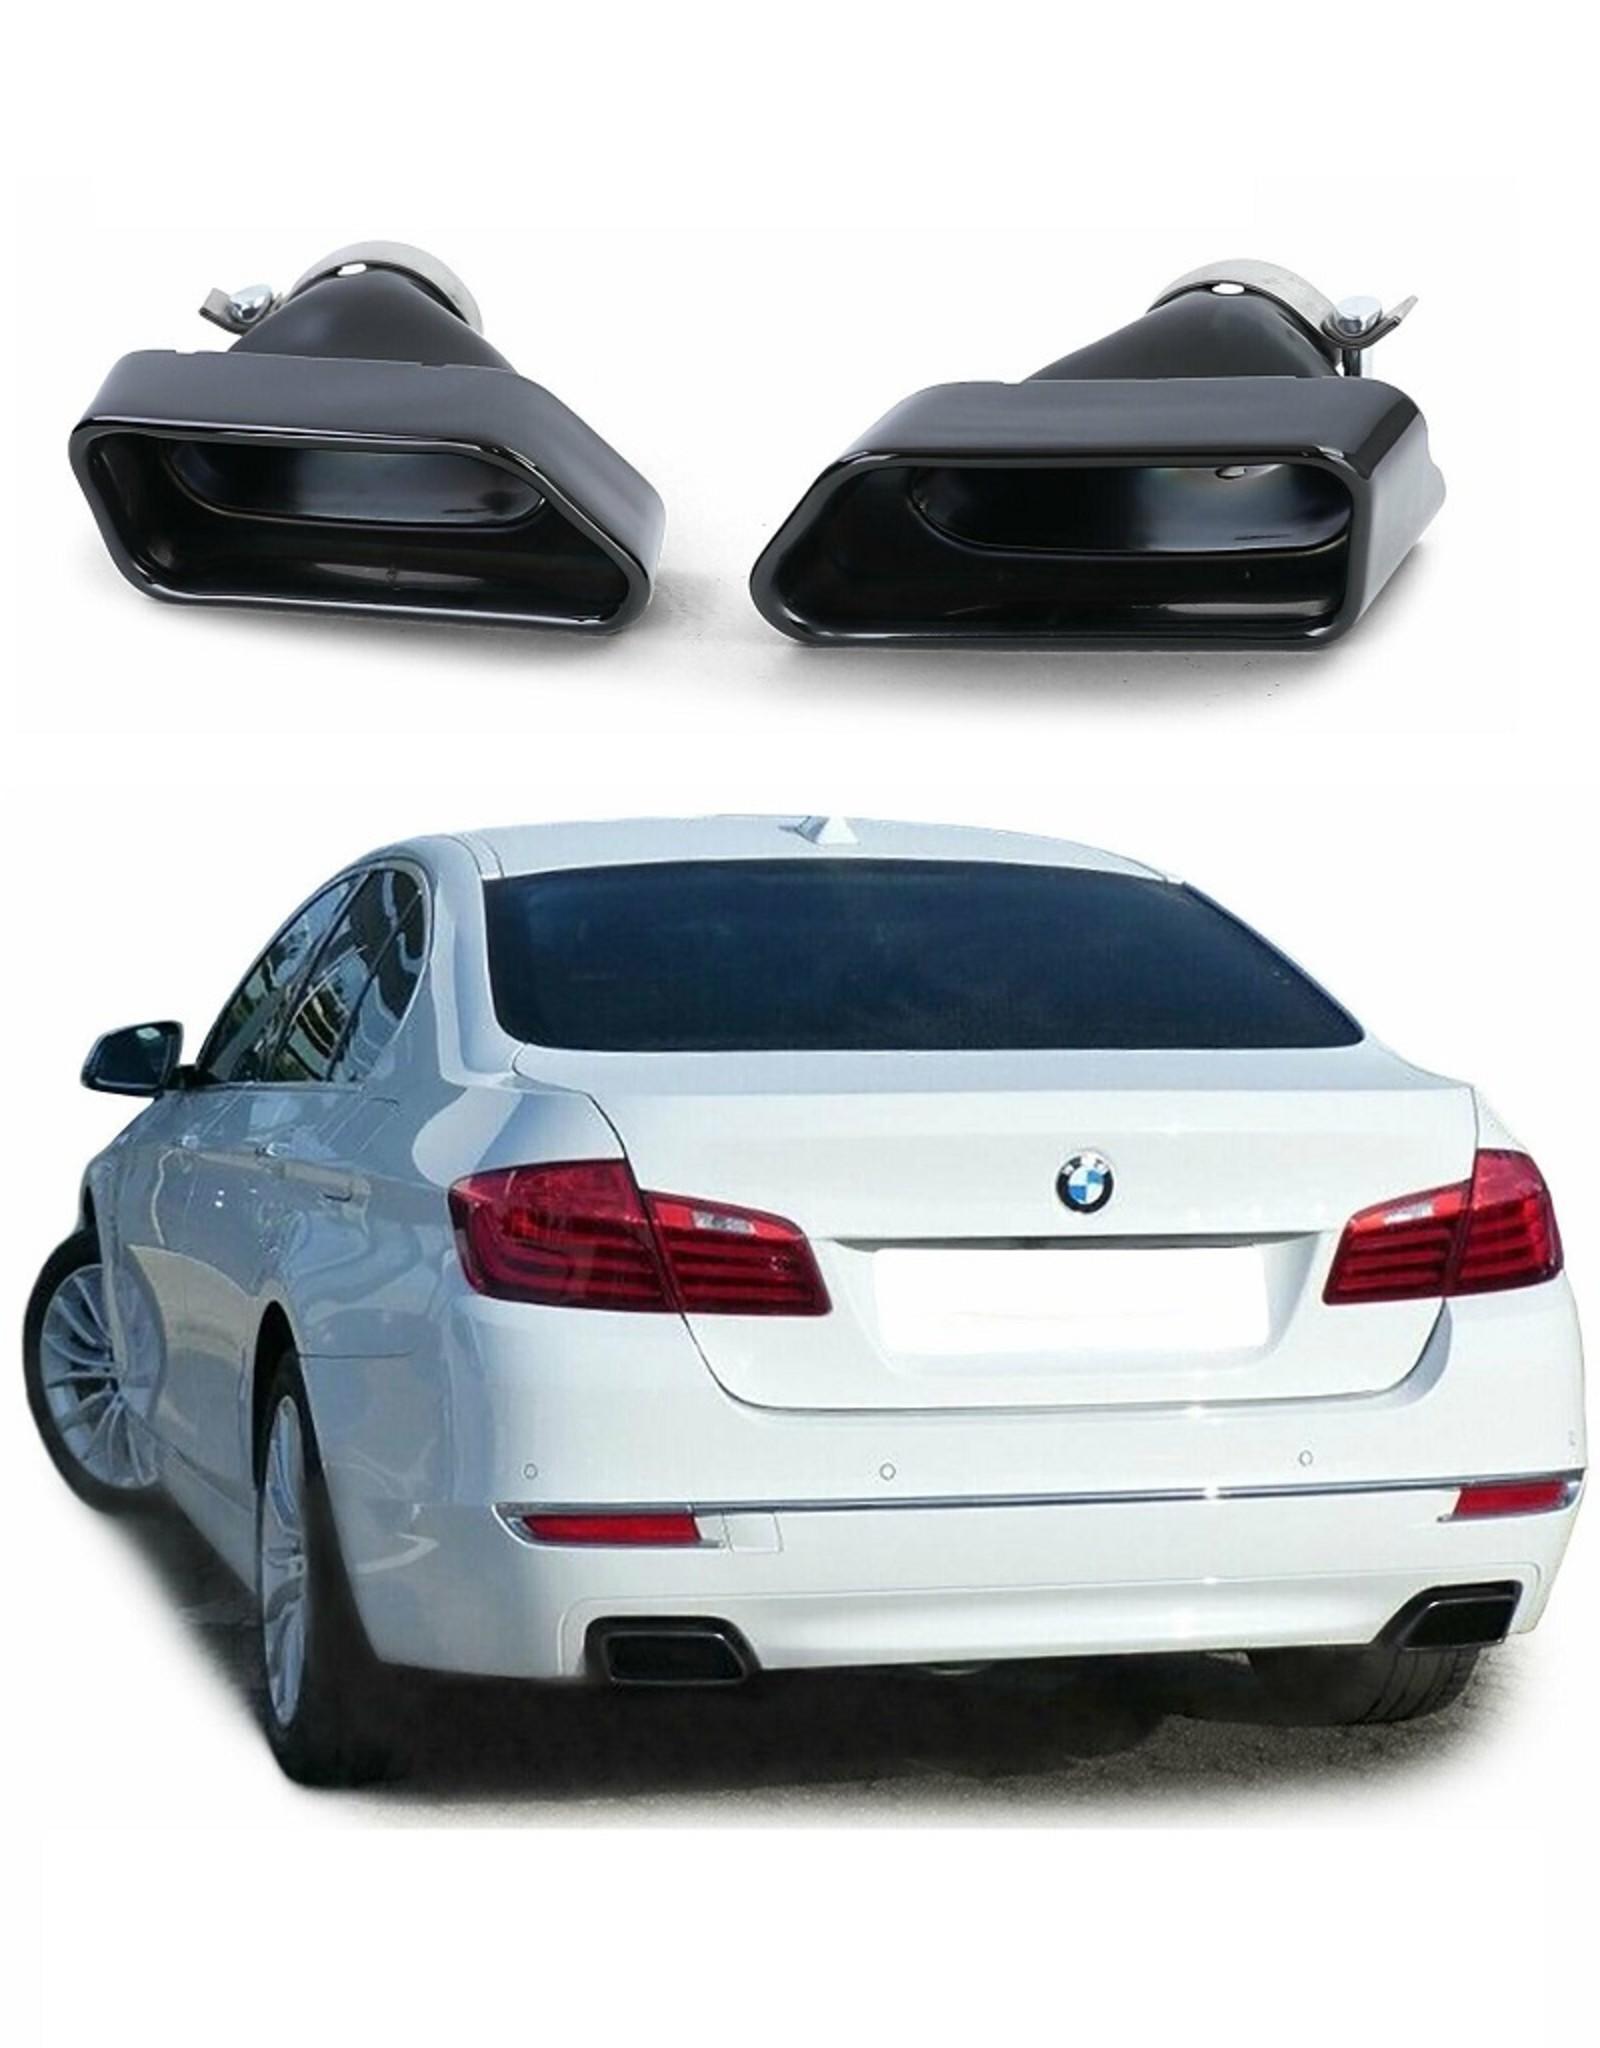 BMW 5 Serie F10 F11 zwarte RVS sierstukken 550i 550d look